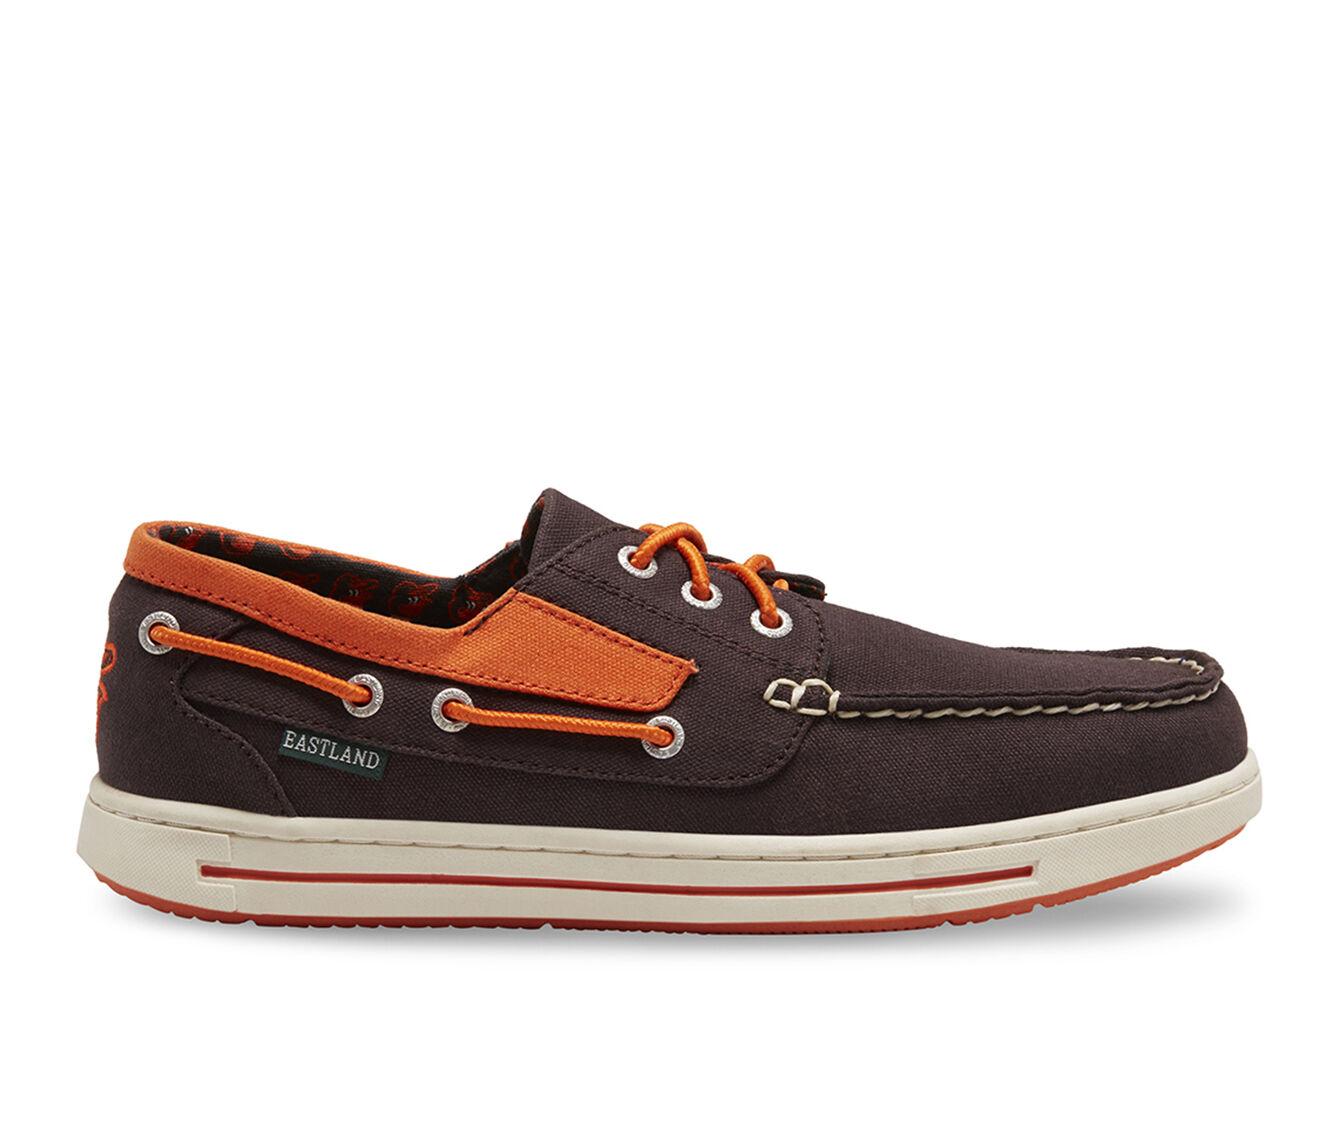 find cheap authentic Men's Eastland Adventure MLB Orioles Boat Shoes Grey